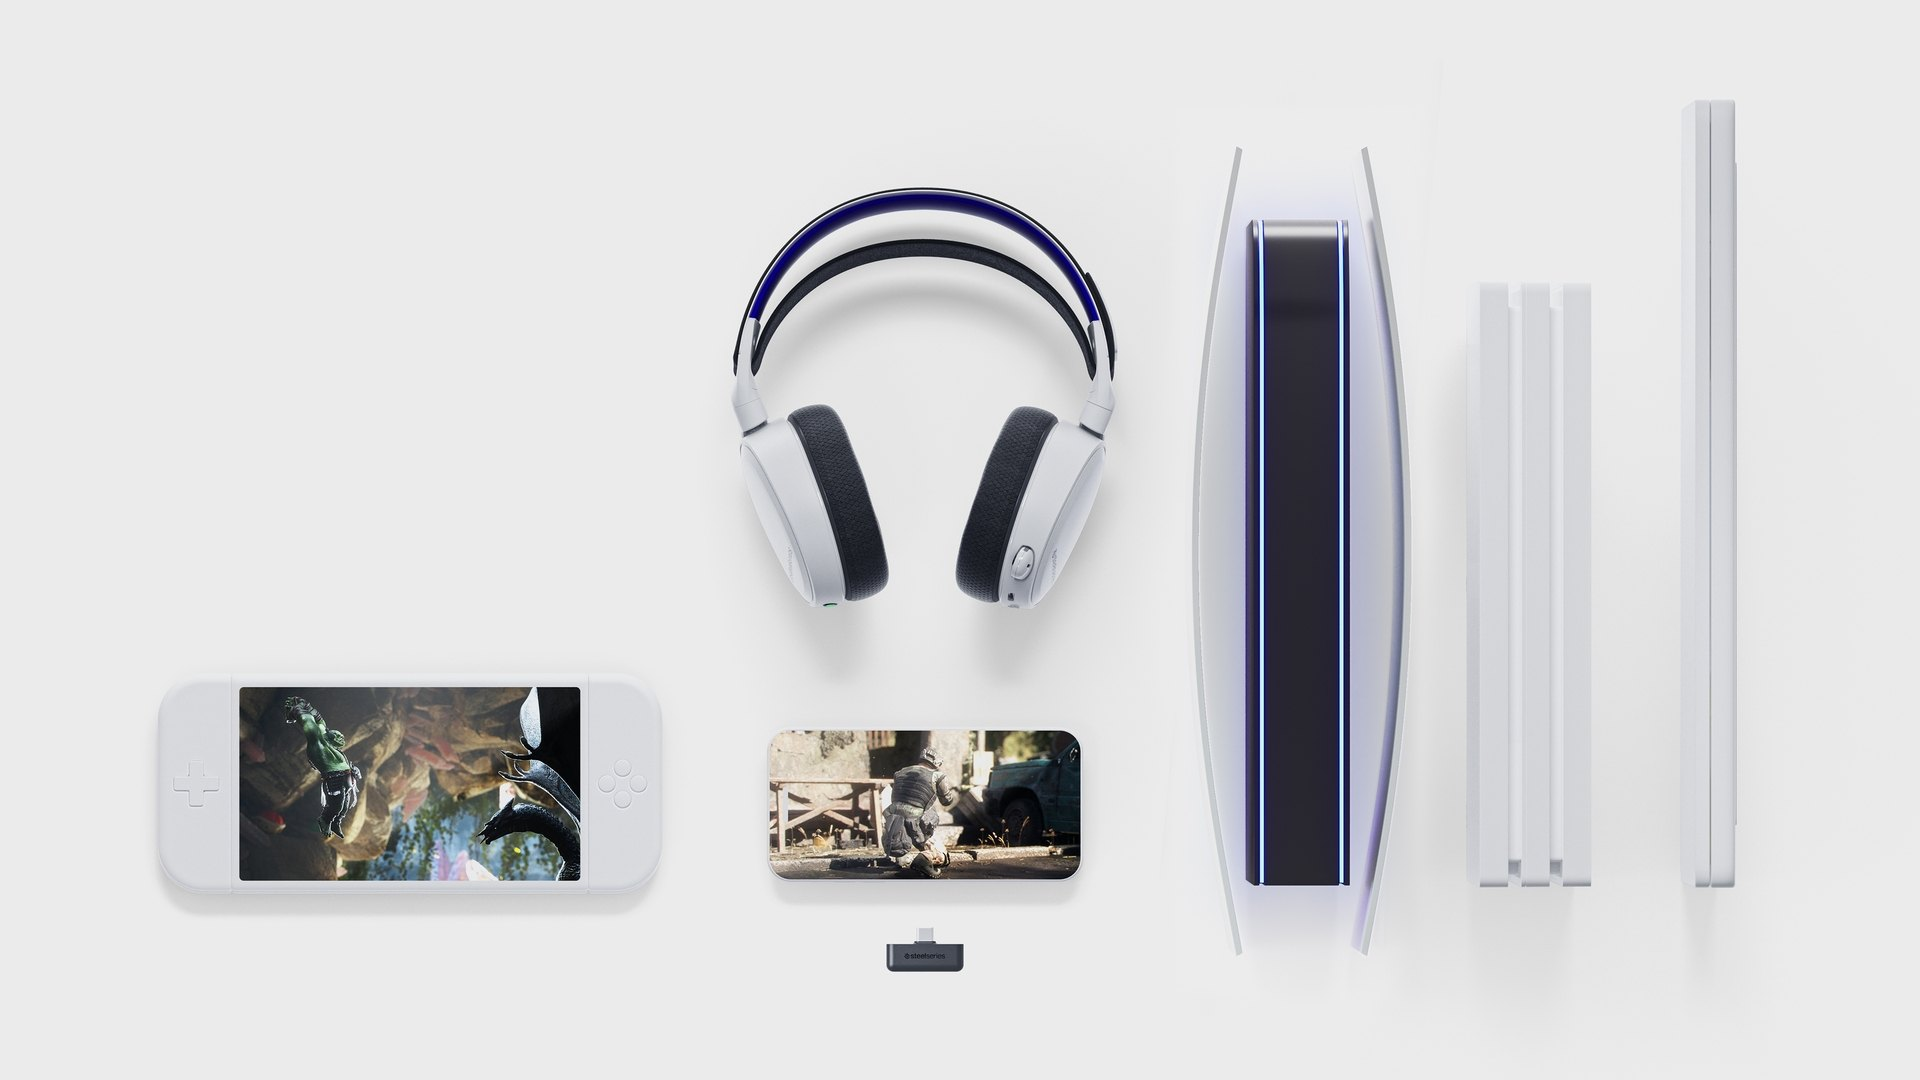 Android、iphone、PS4、PS5 與 PC 都顯示出對耳機的連線性